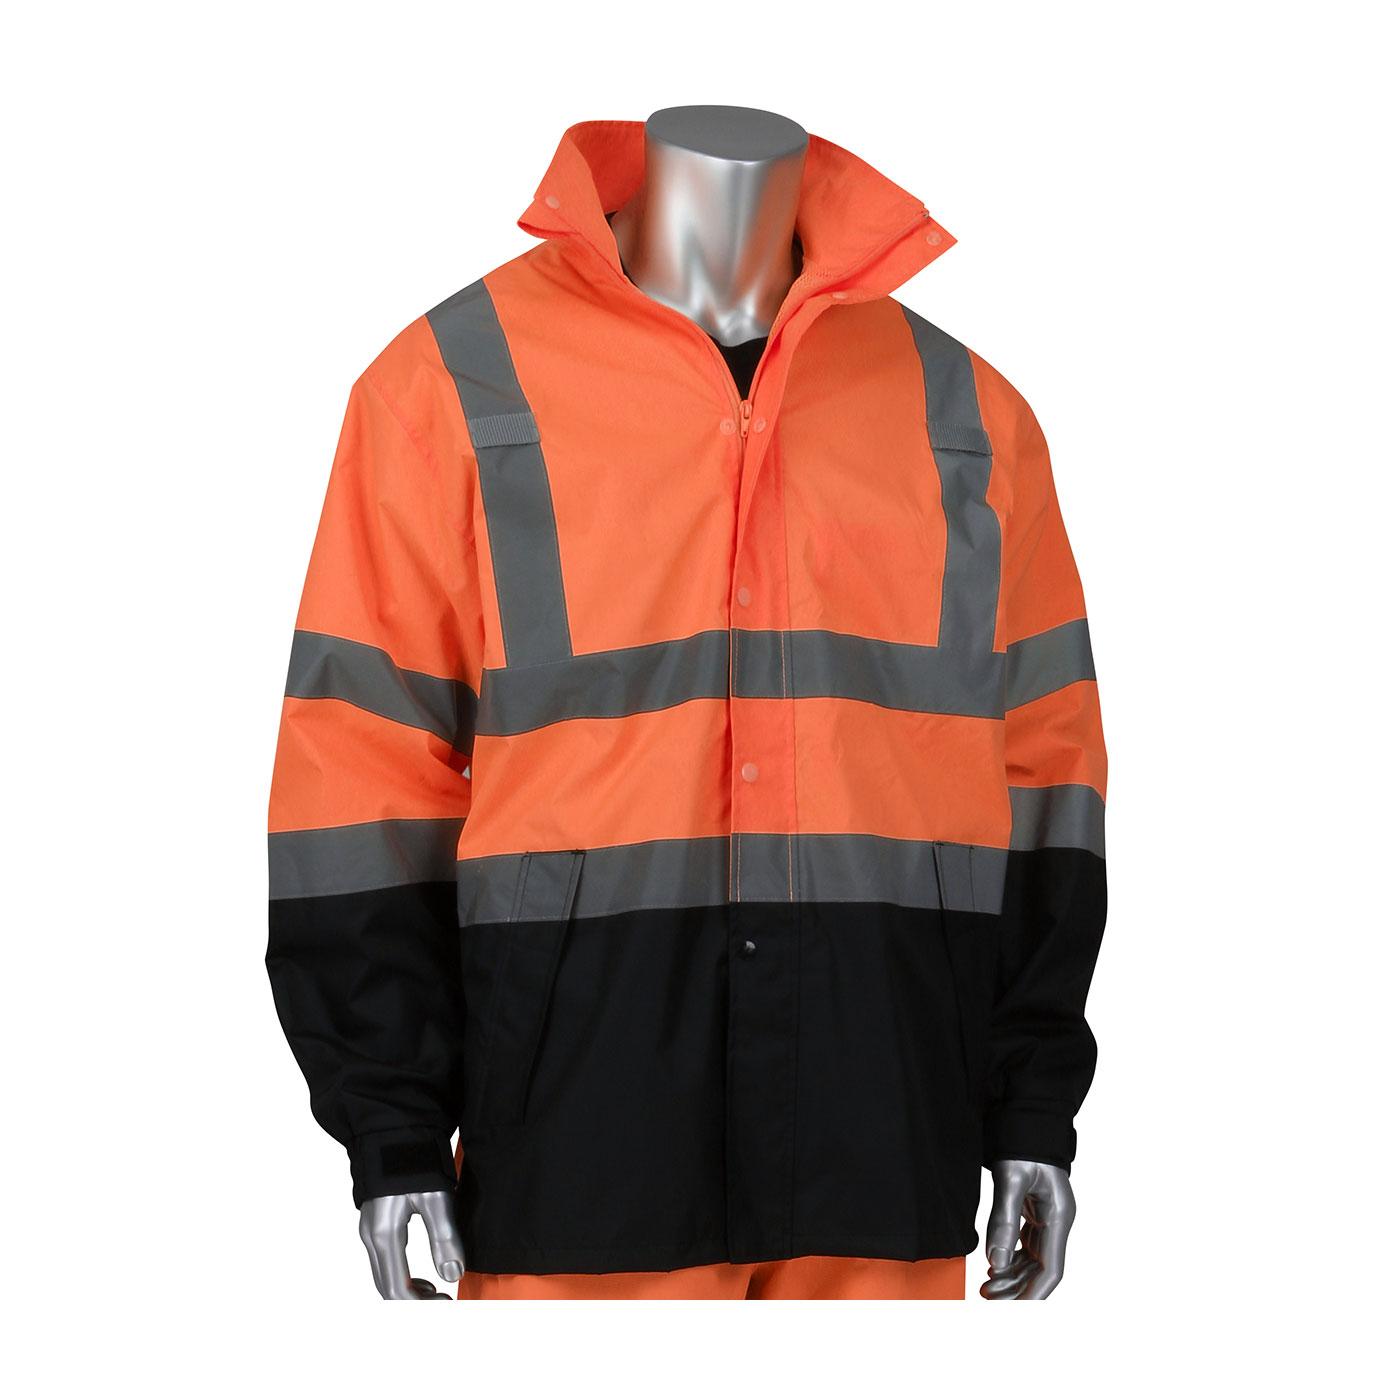 ANSI Type R Class 3 Value All Purpose Waterproof Jacket with Black Bottom, Hi-Vis Orange, L-XL